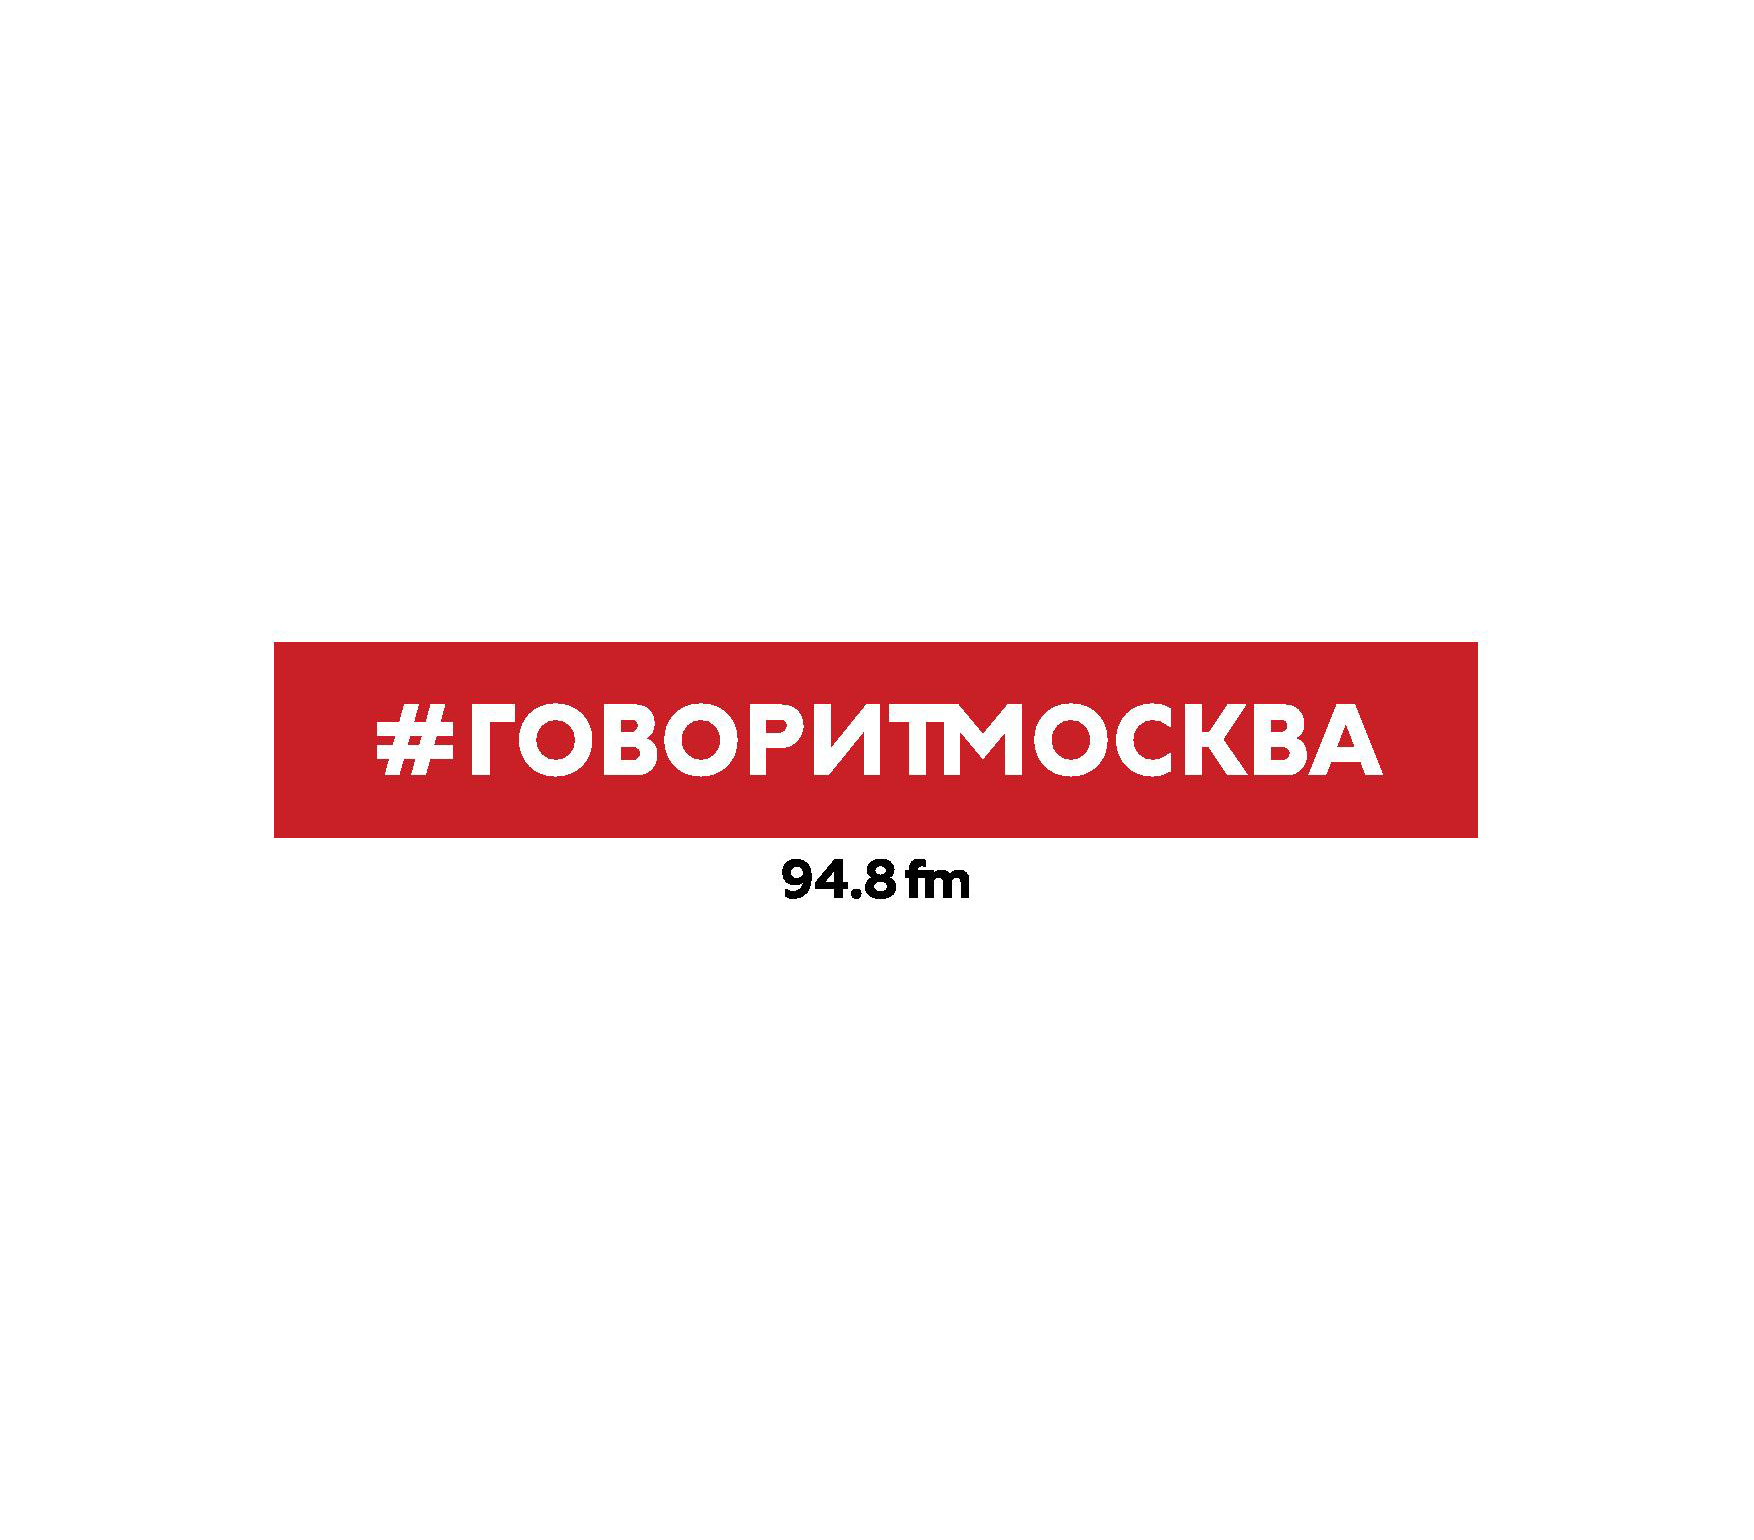 Макс Челноков 5 апреля. Евгений Бушмин